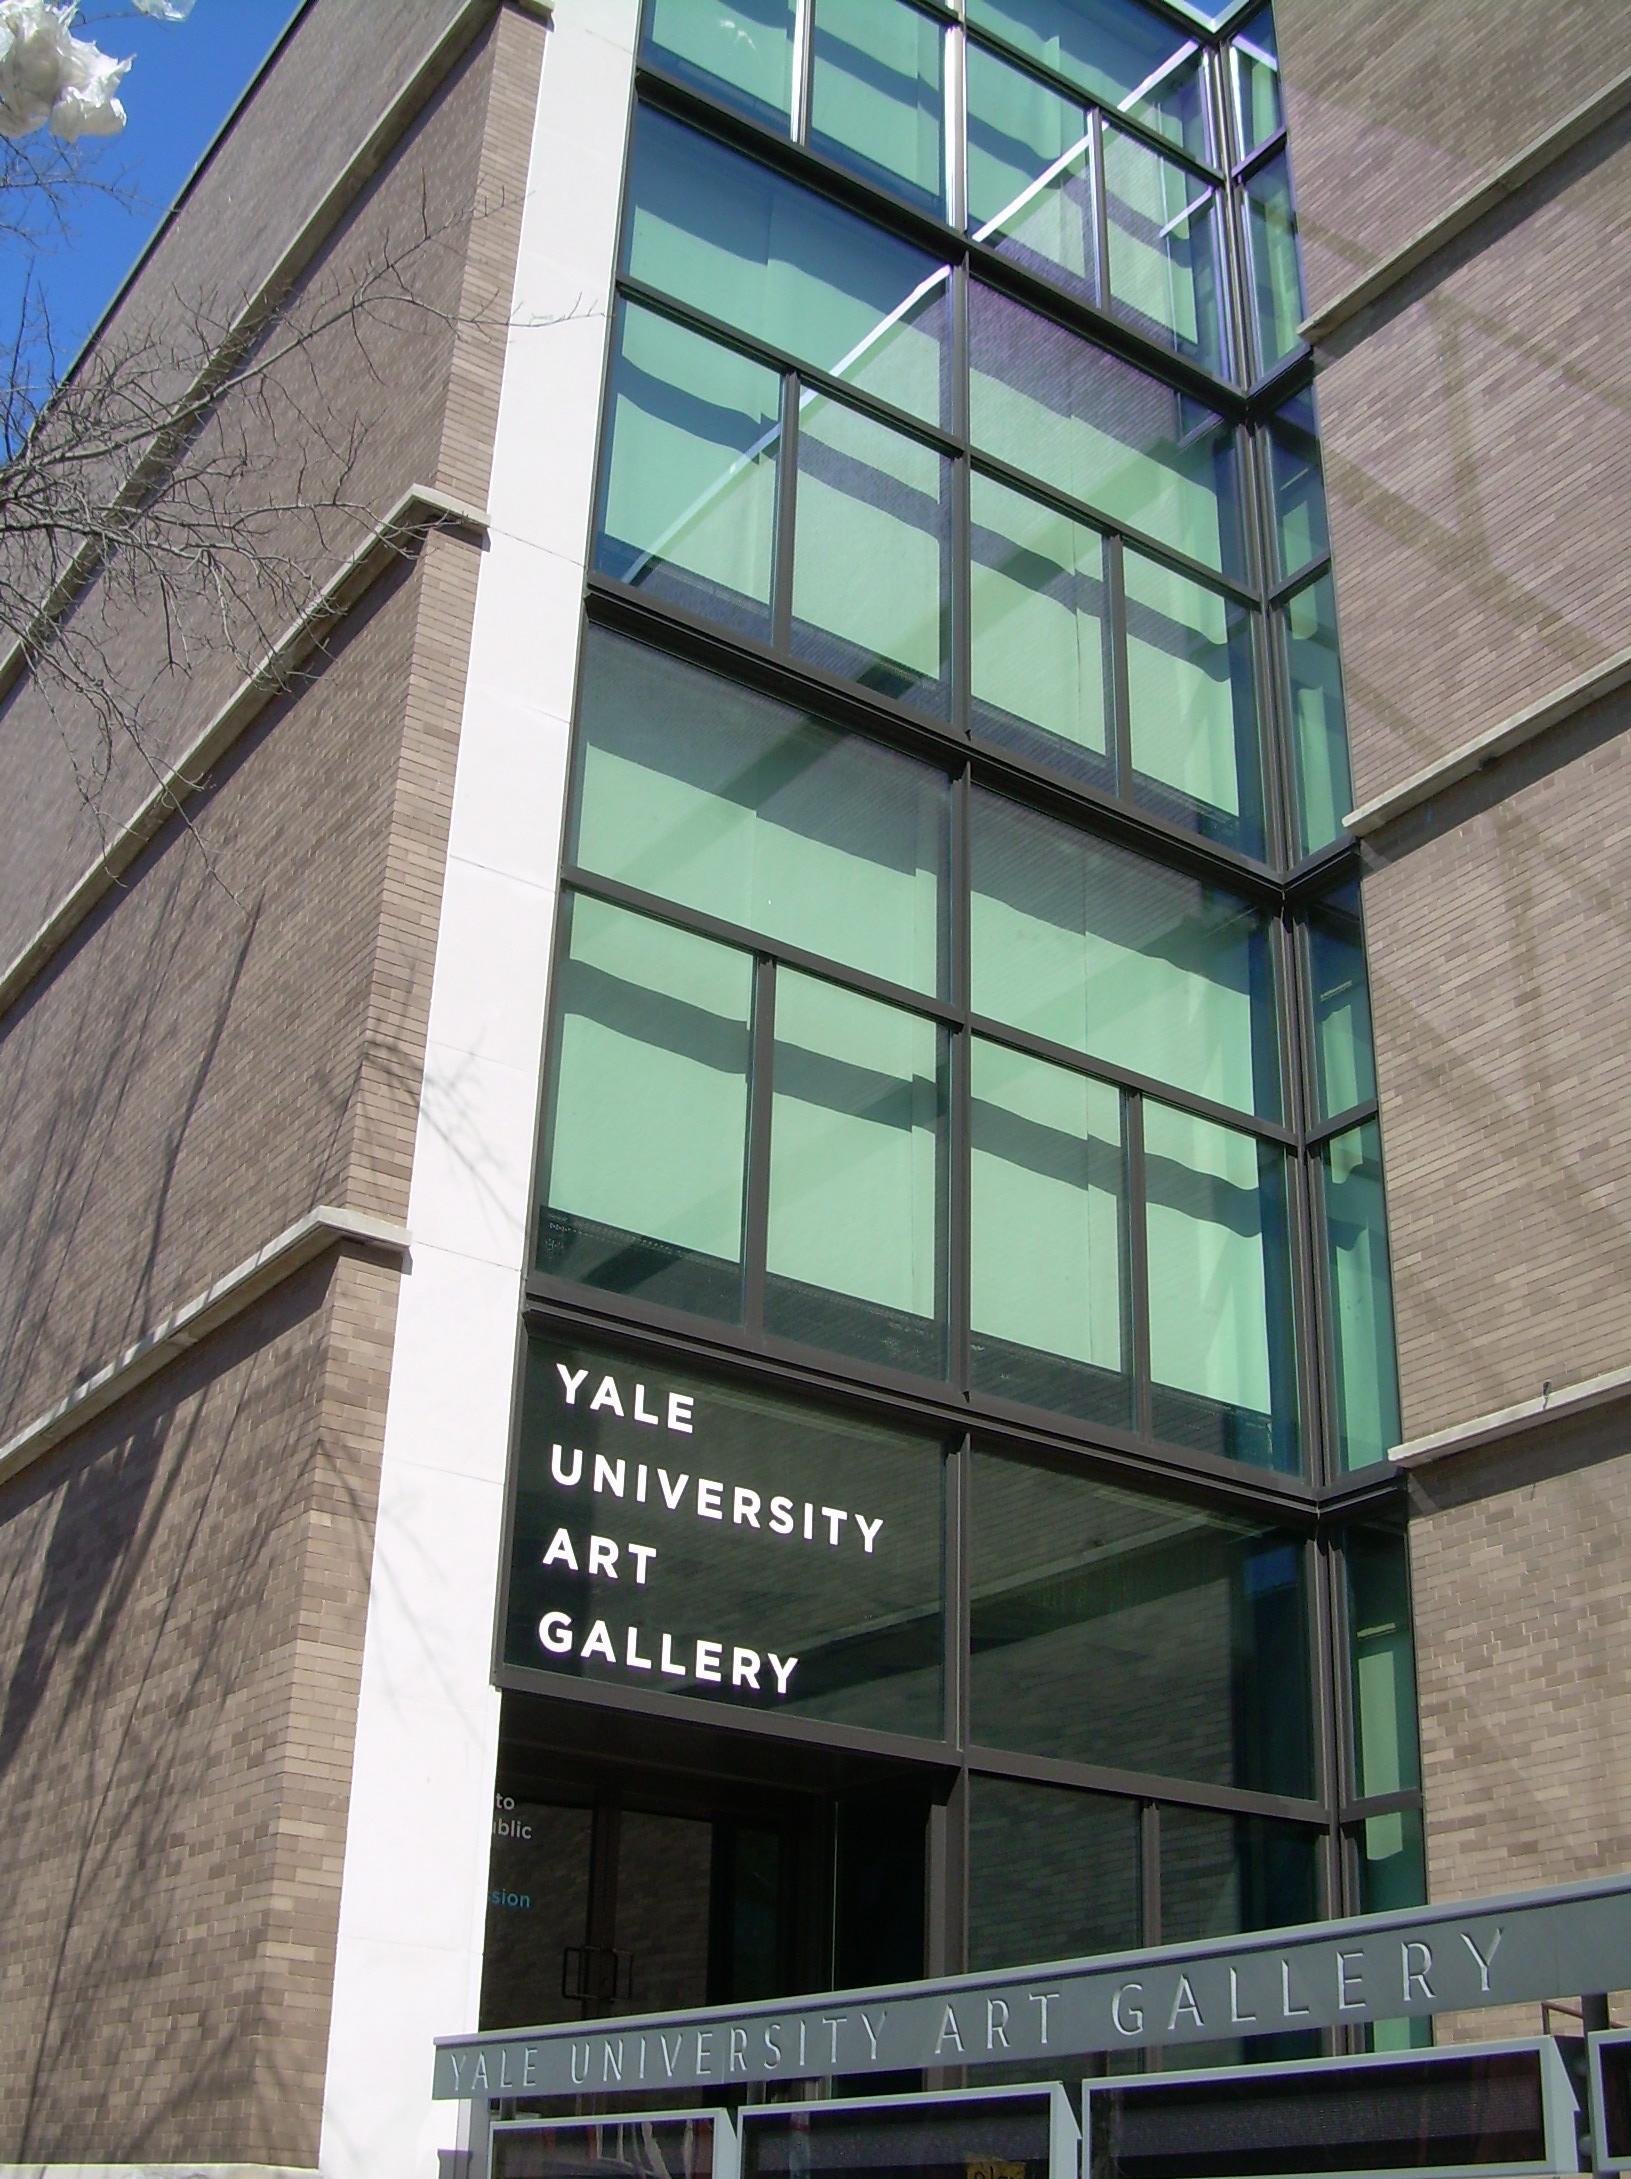 gallery of the university - photo #4